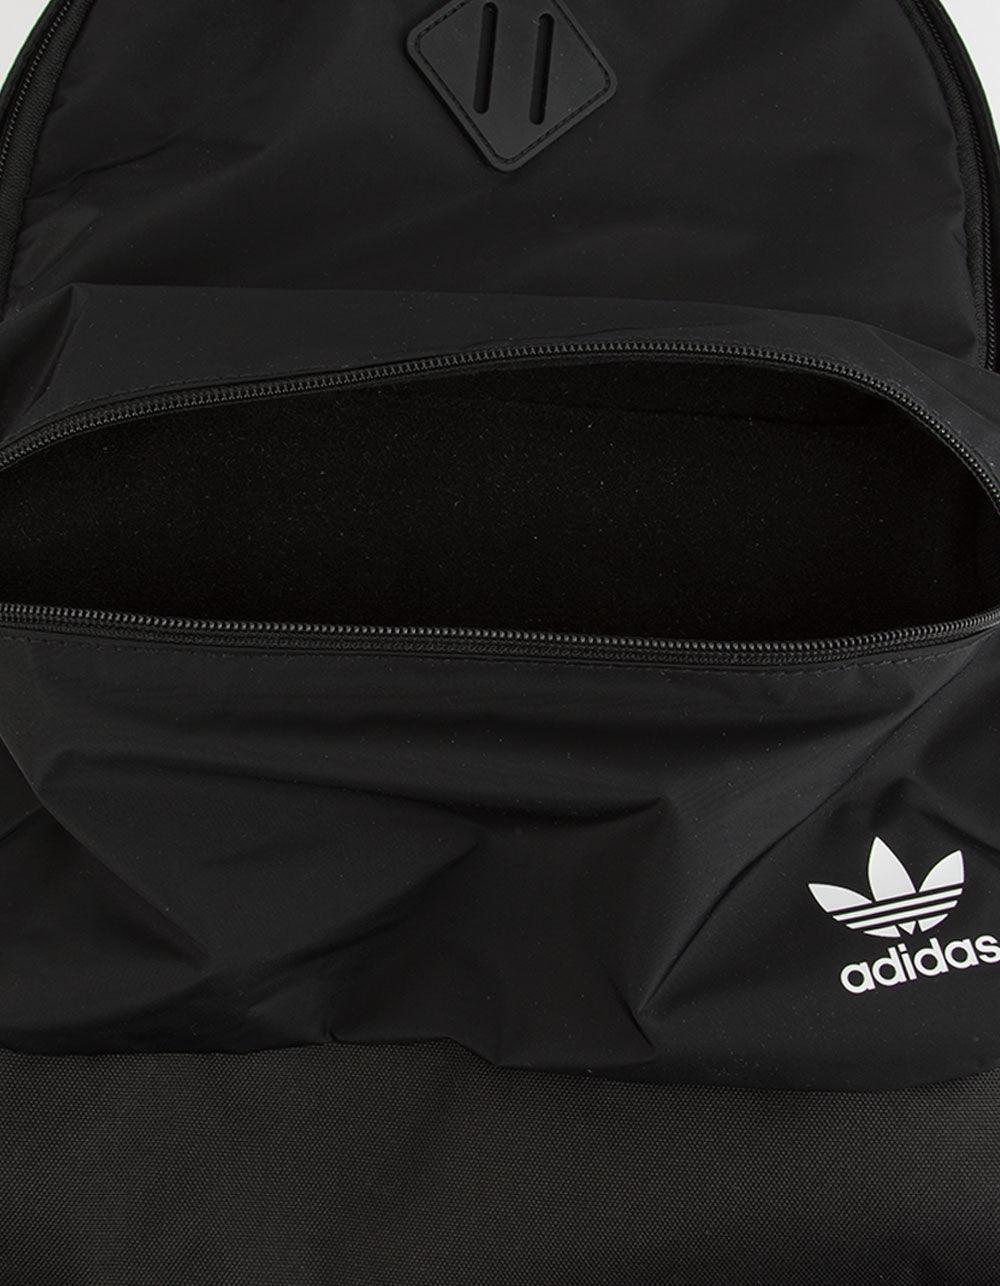 efaf9c68b624 Adidas National Black And White Backpack- Fenix Toulouse Handball